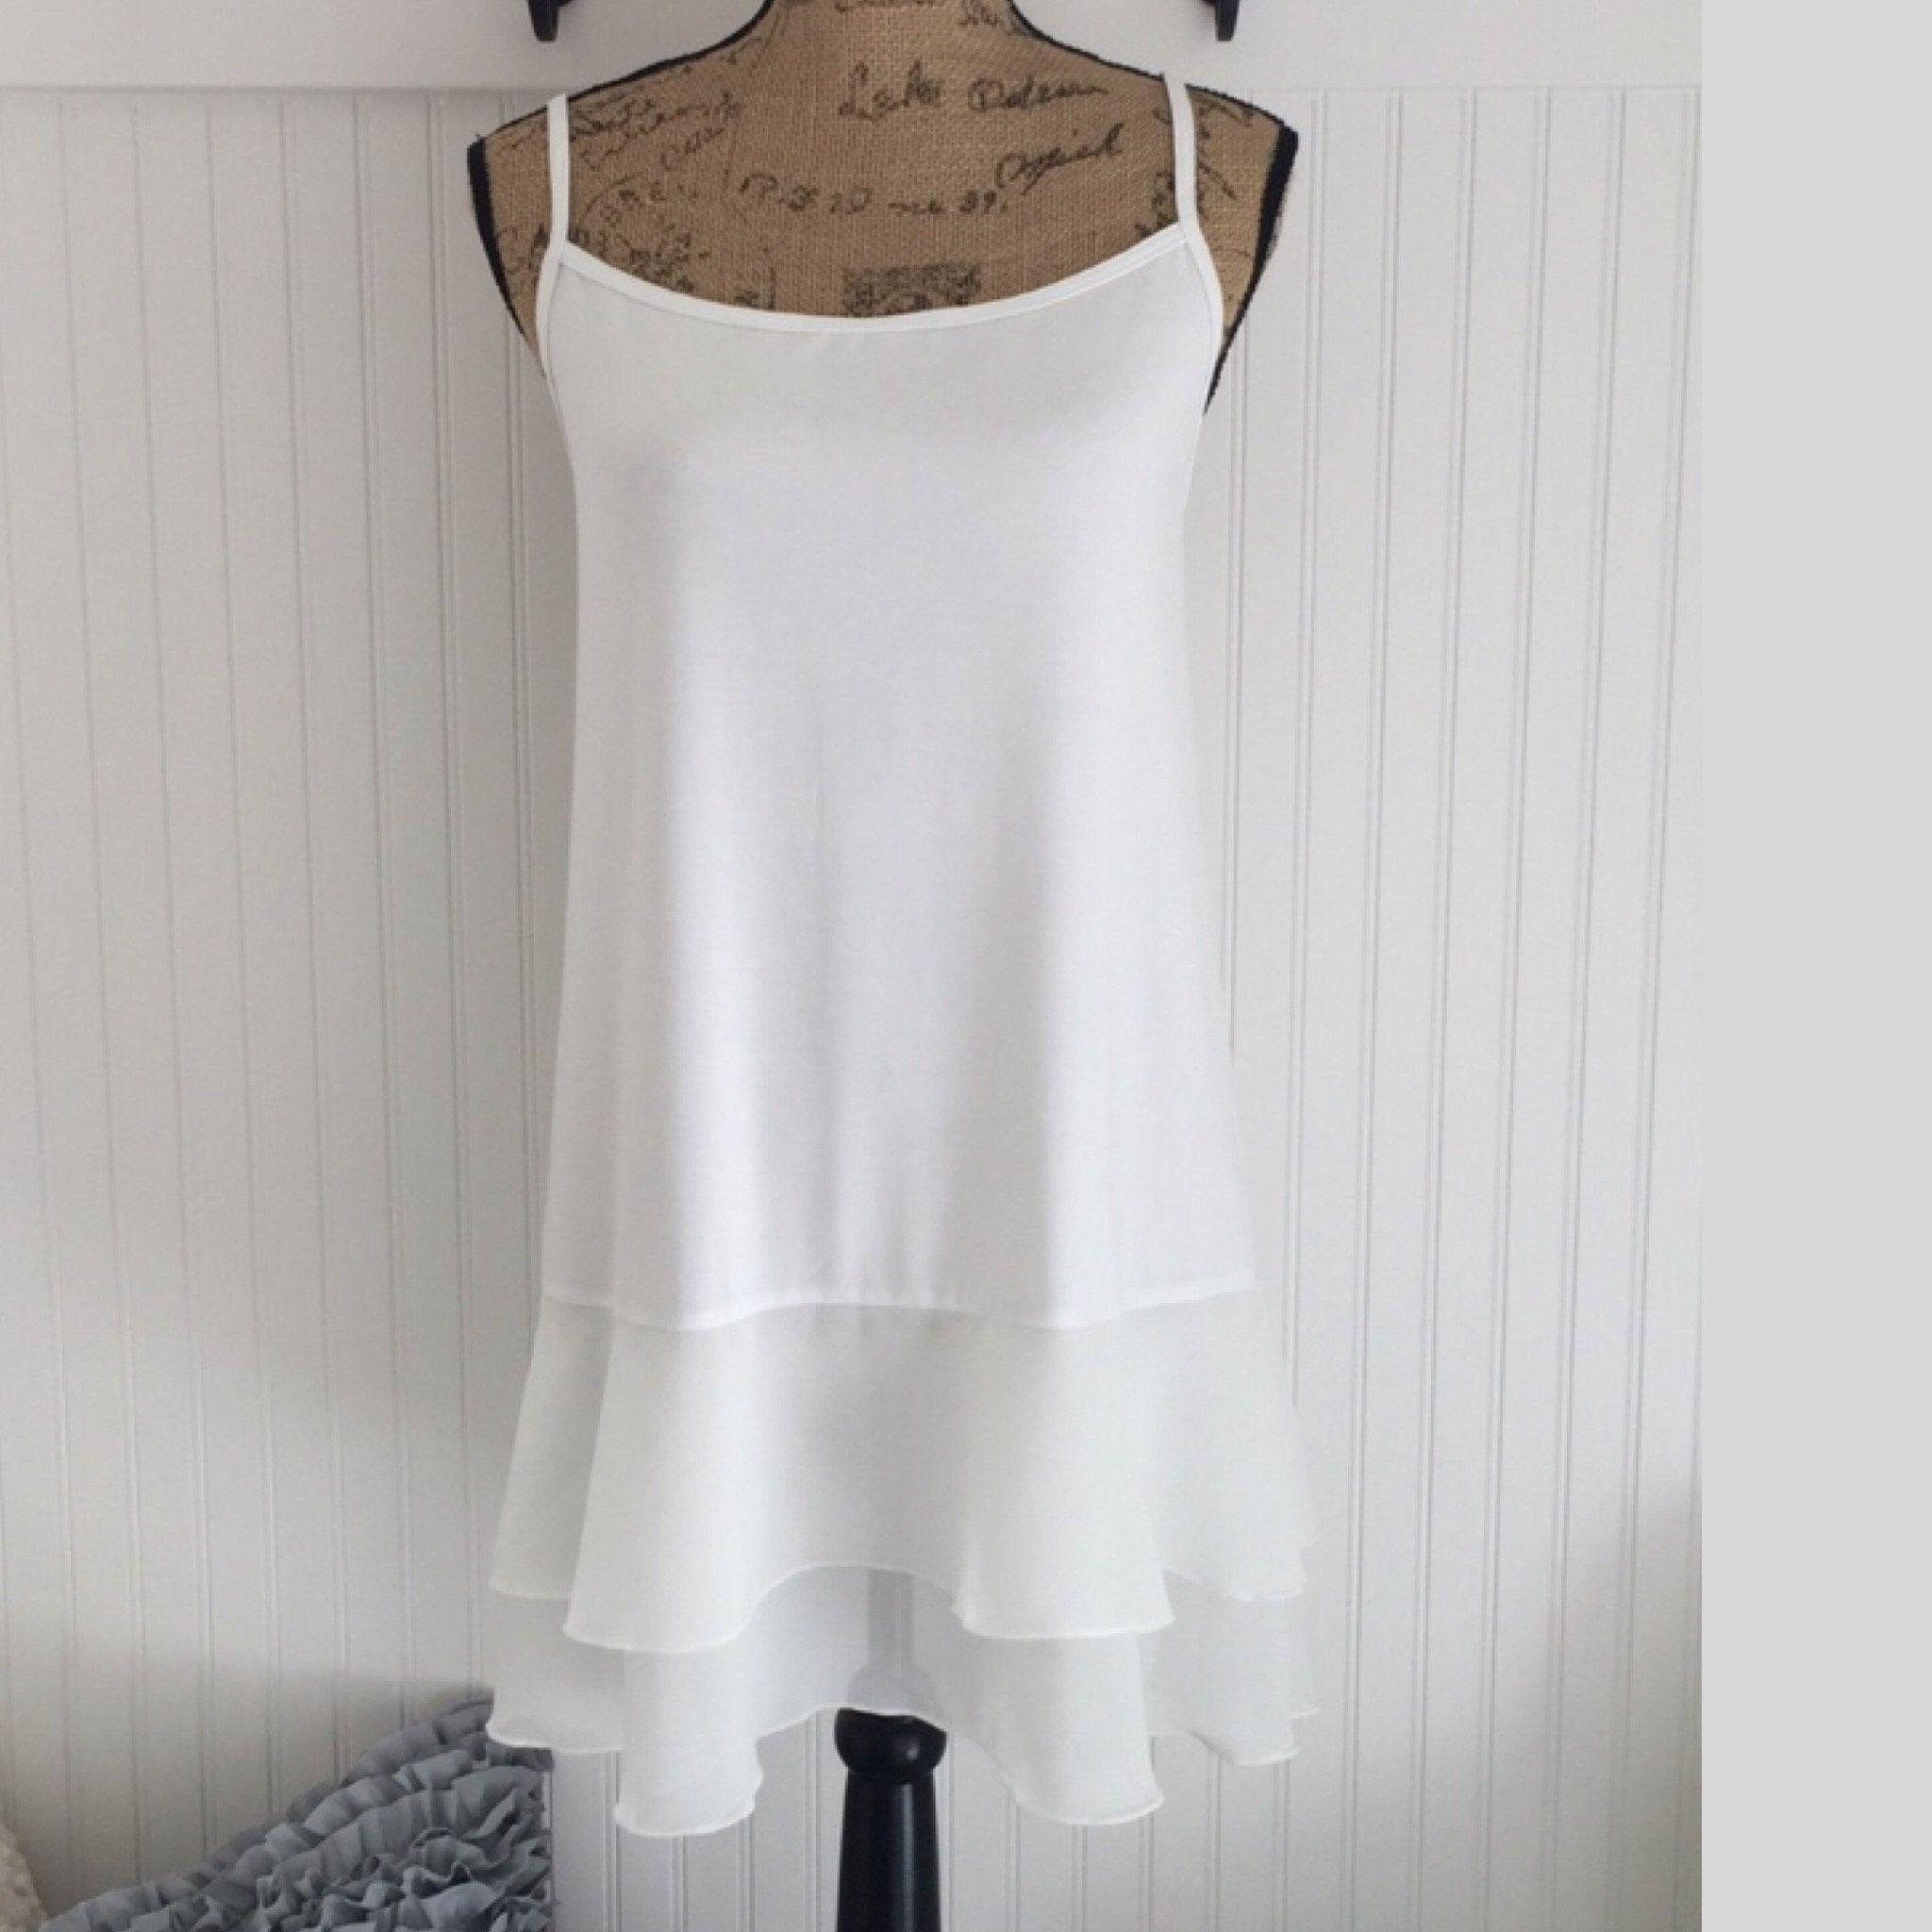 Modest Opaque Lace Dress Extender HALF SLIP *Style 2 Lined* size S-4XL Plus Size